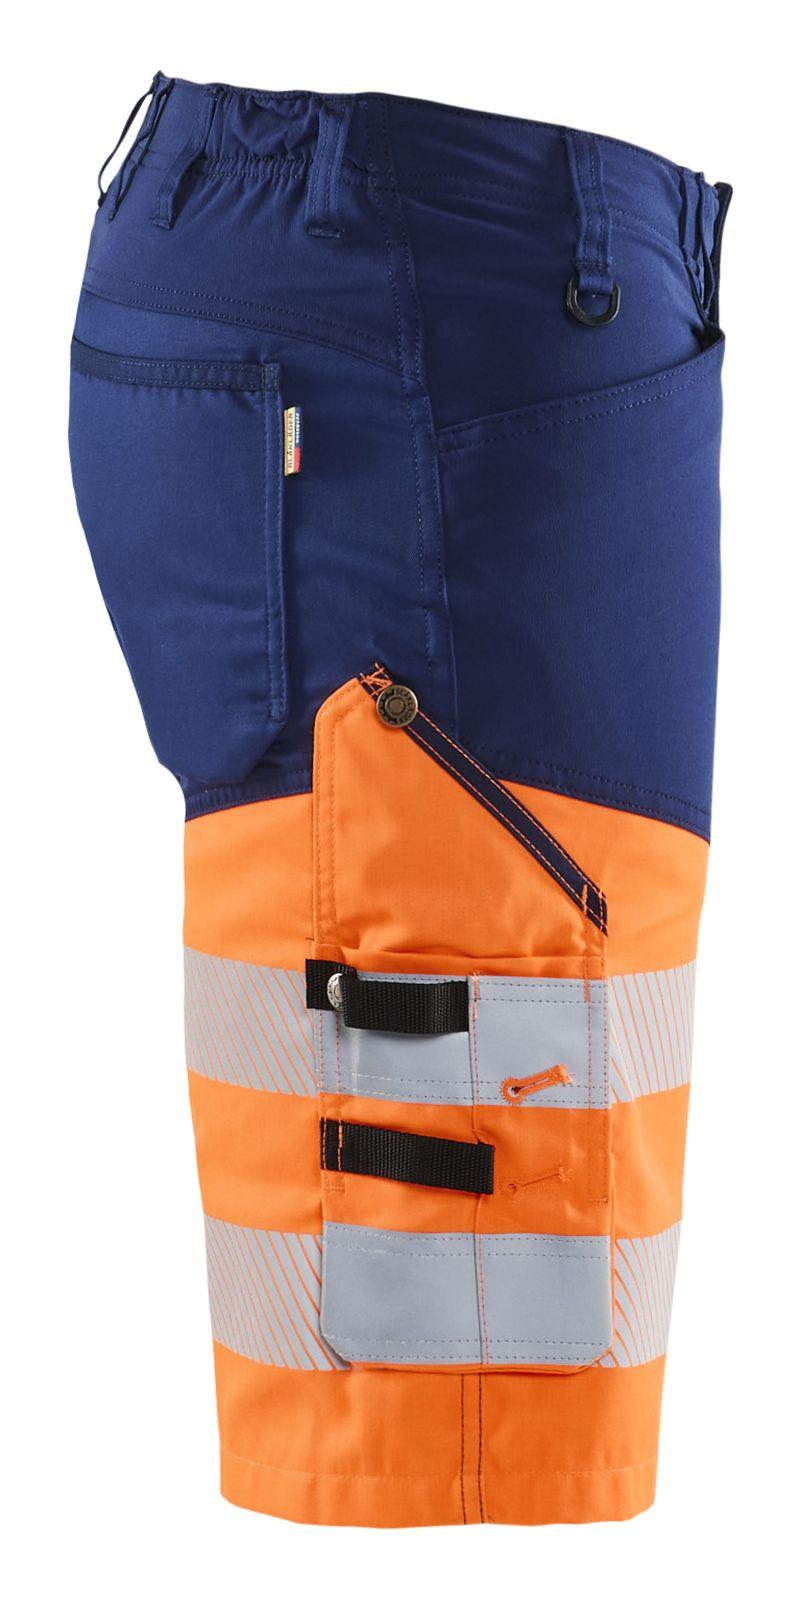 Blaklader Broeken 15411811 High Vis marineblauw-oranje(8953)